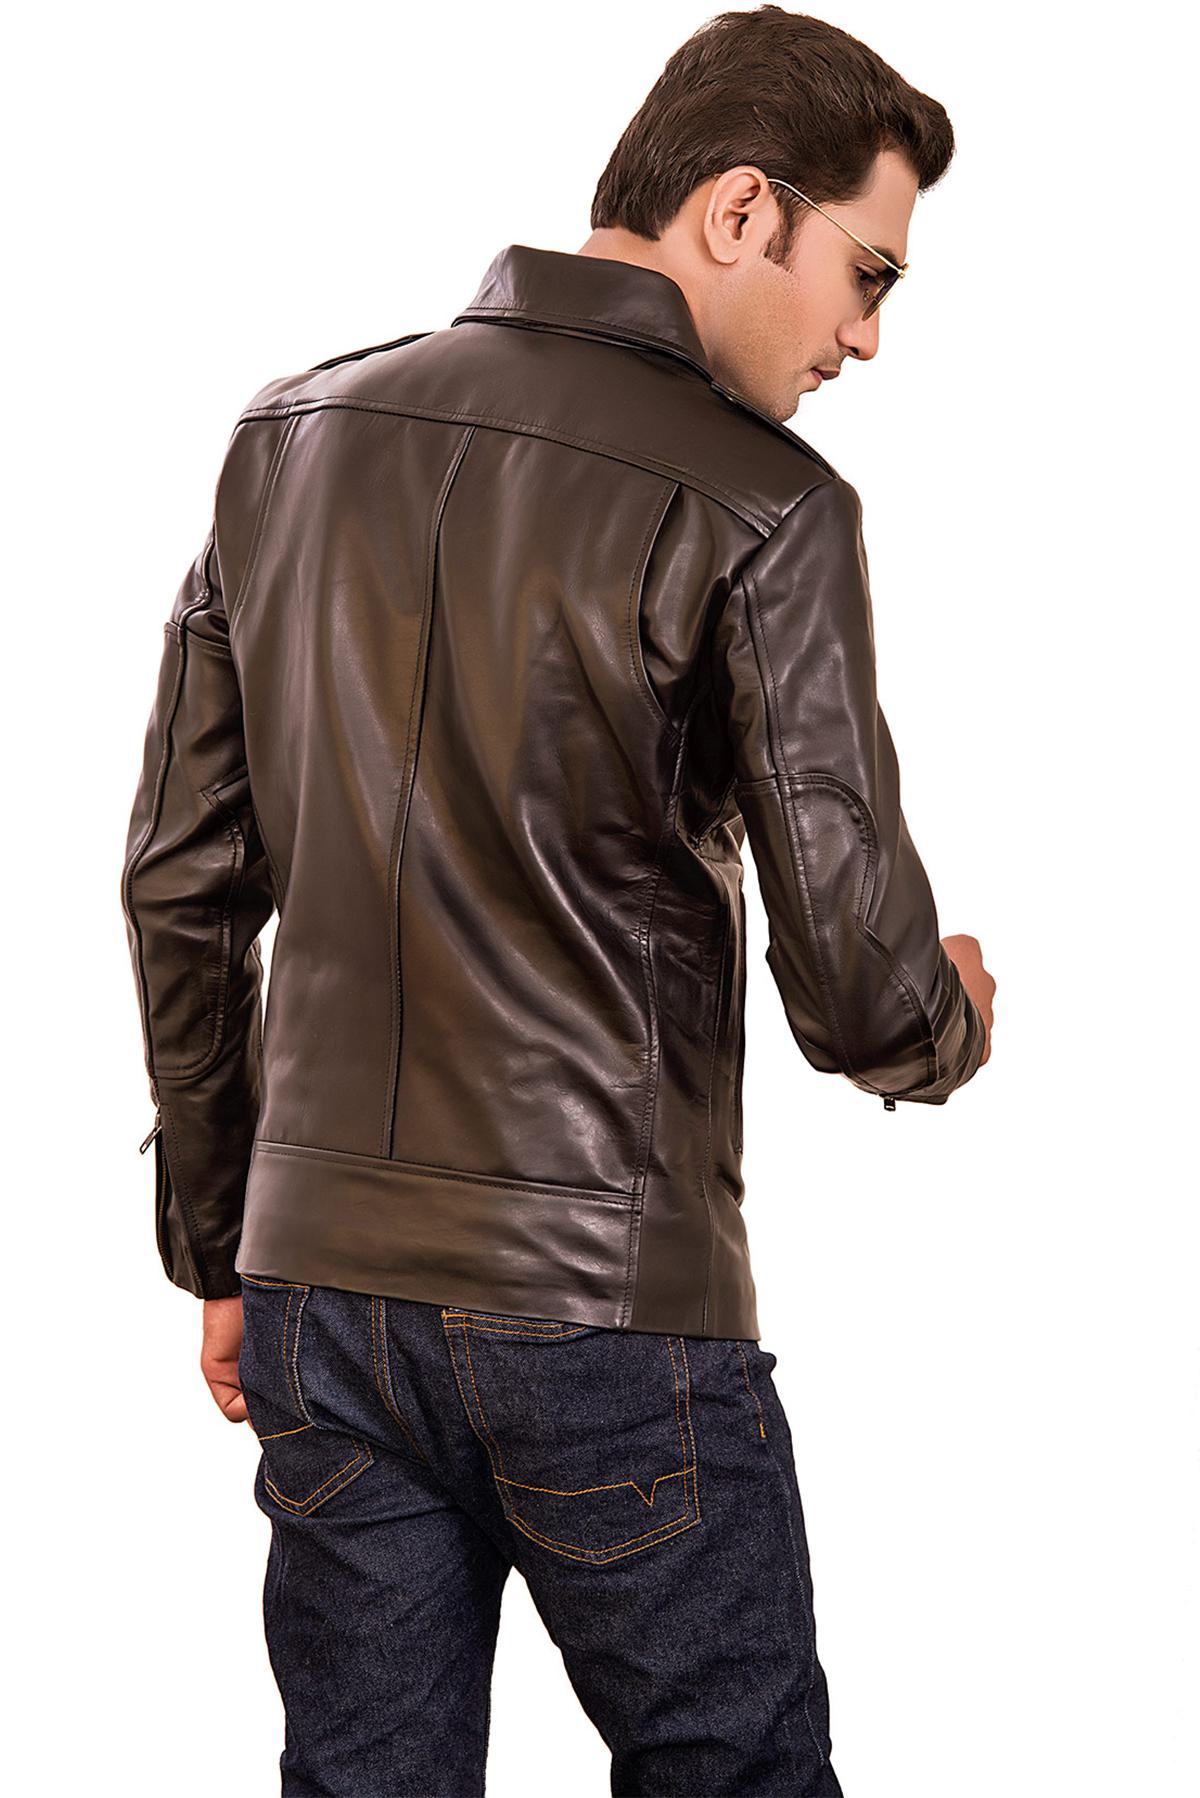 jacket websites